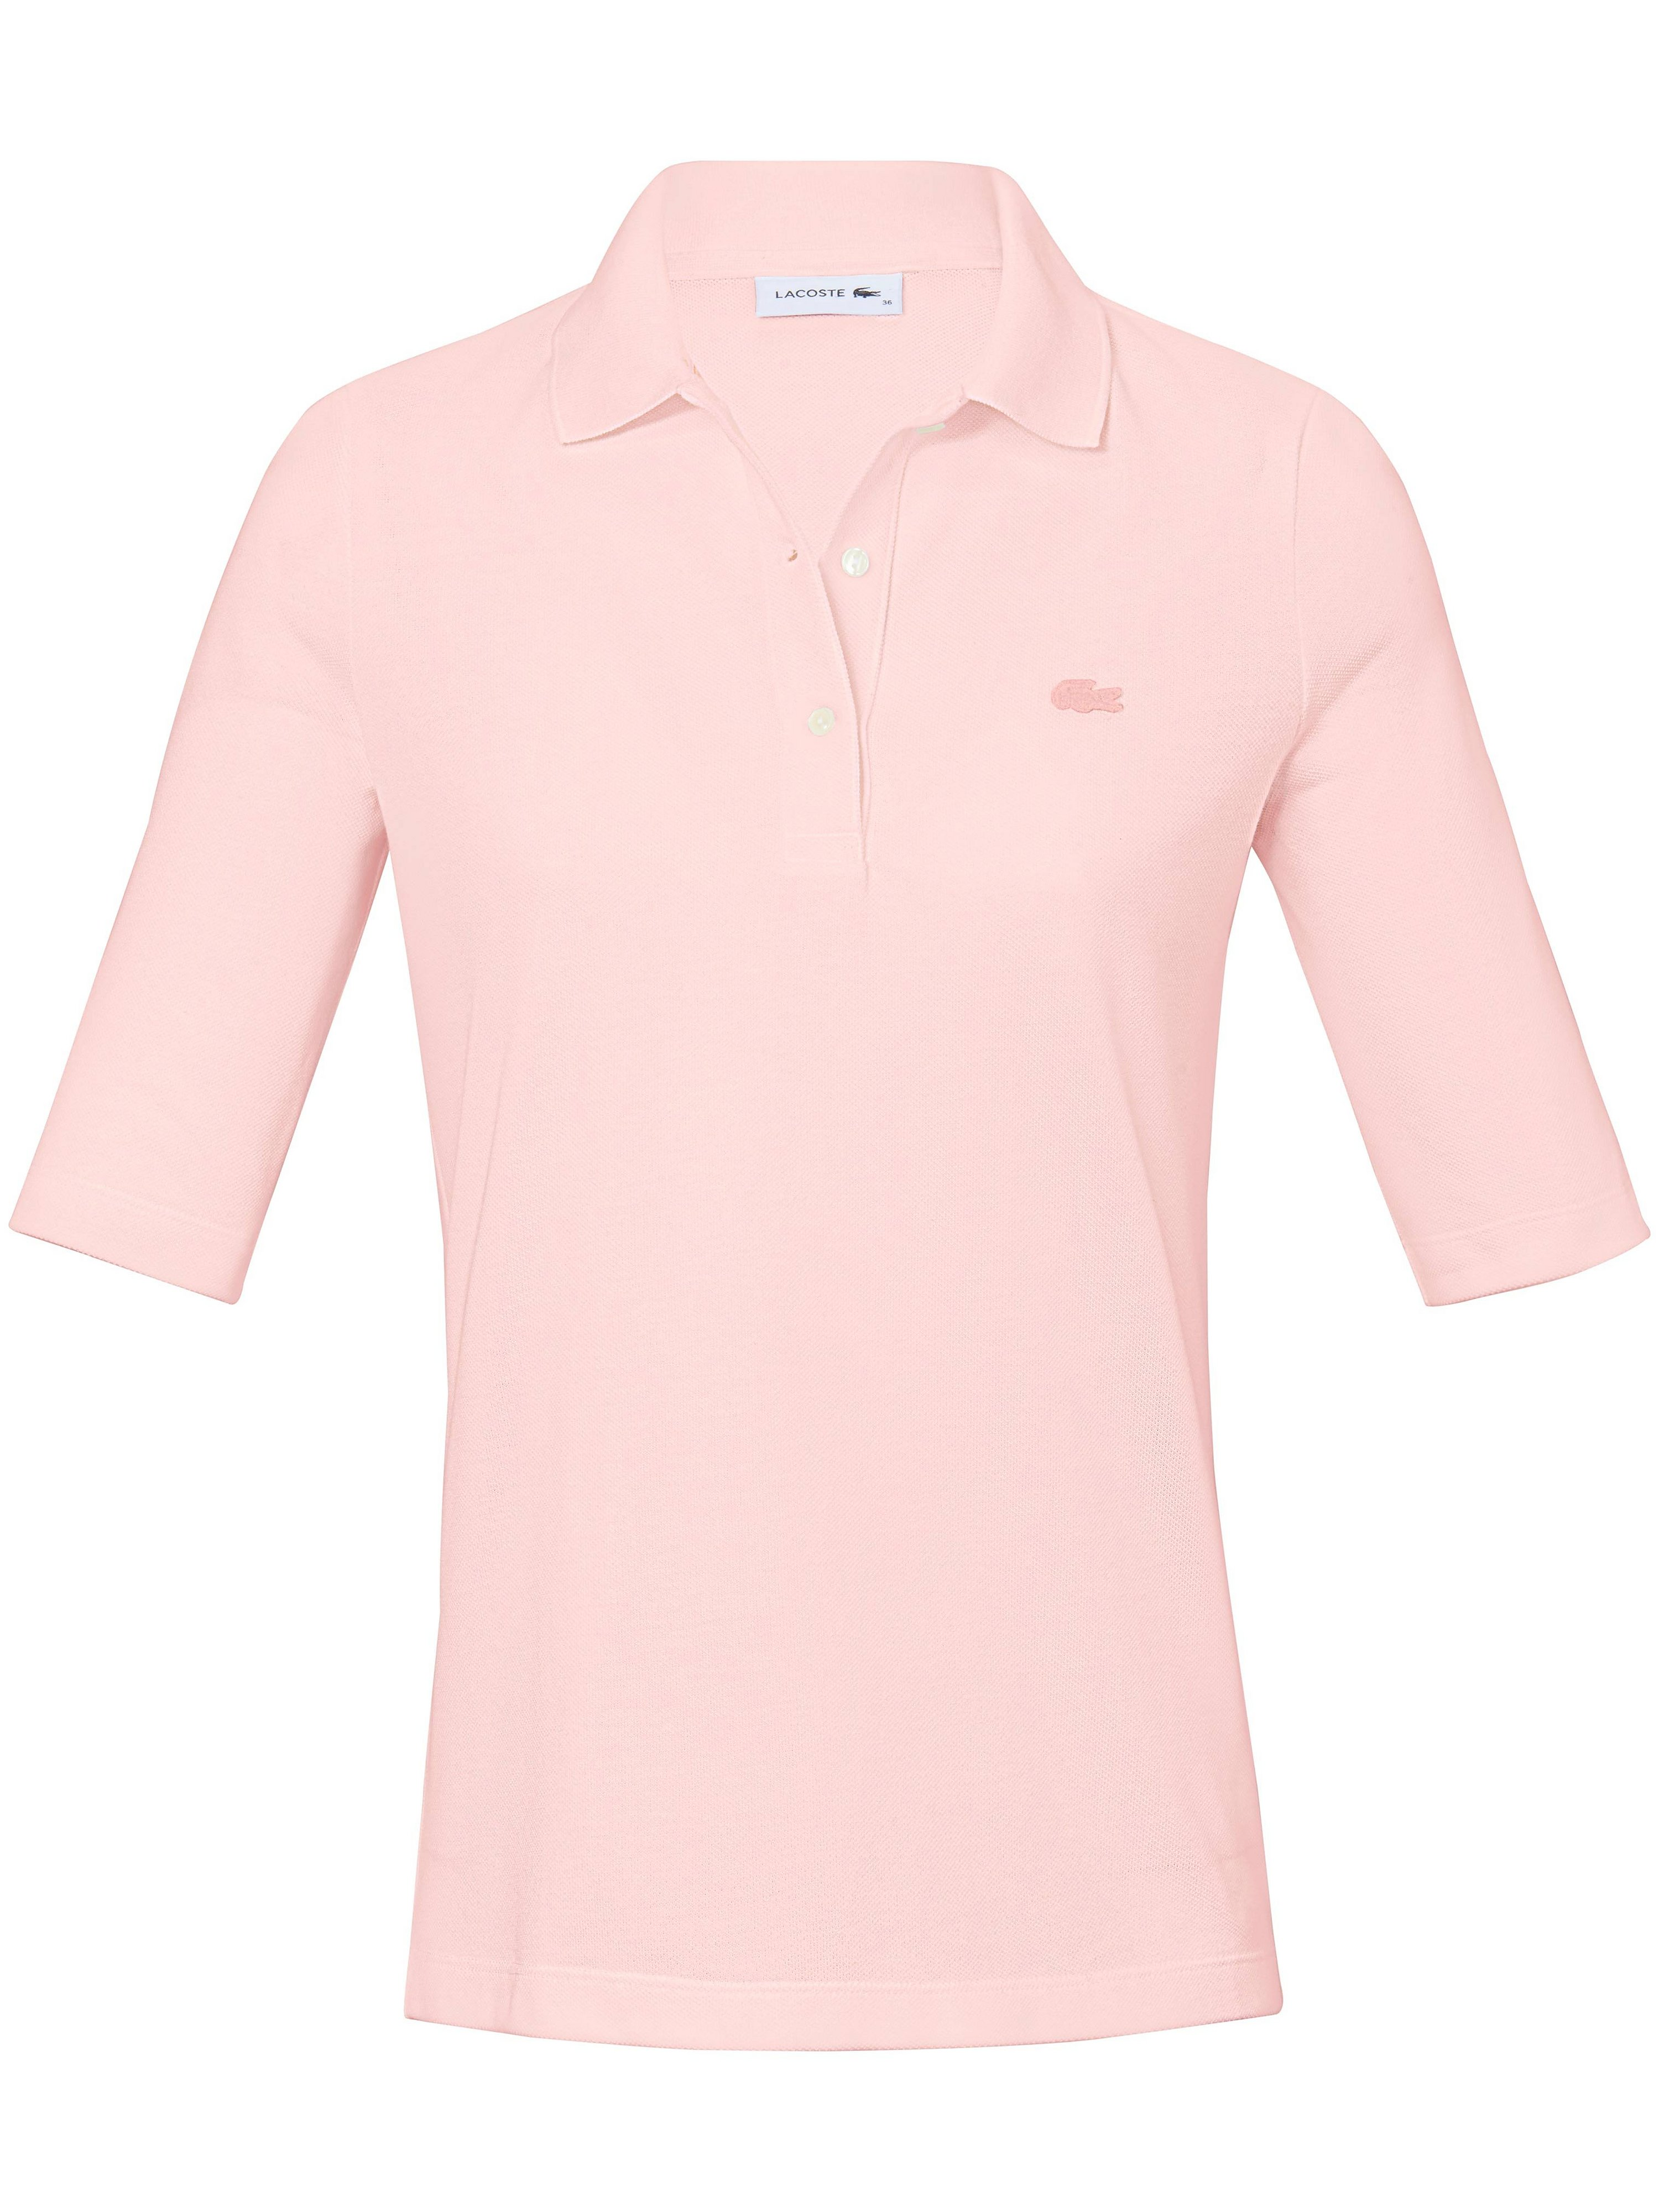 Poloshirt 1/2-lange ærmer 100% bomuld Fra Lacoste rosé